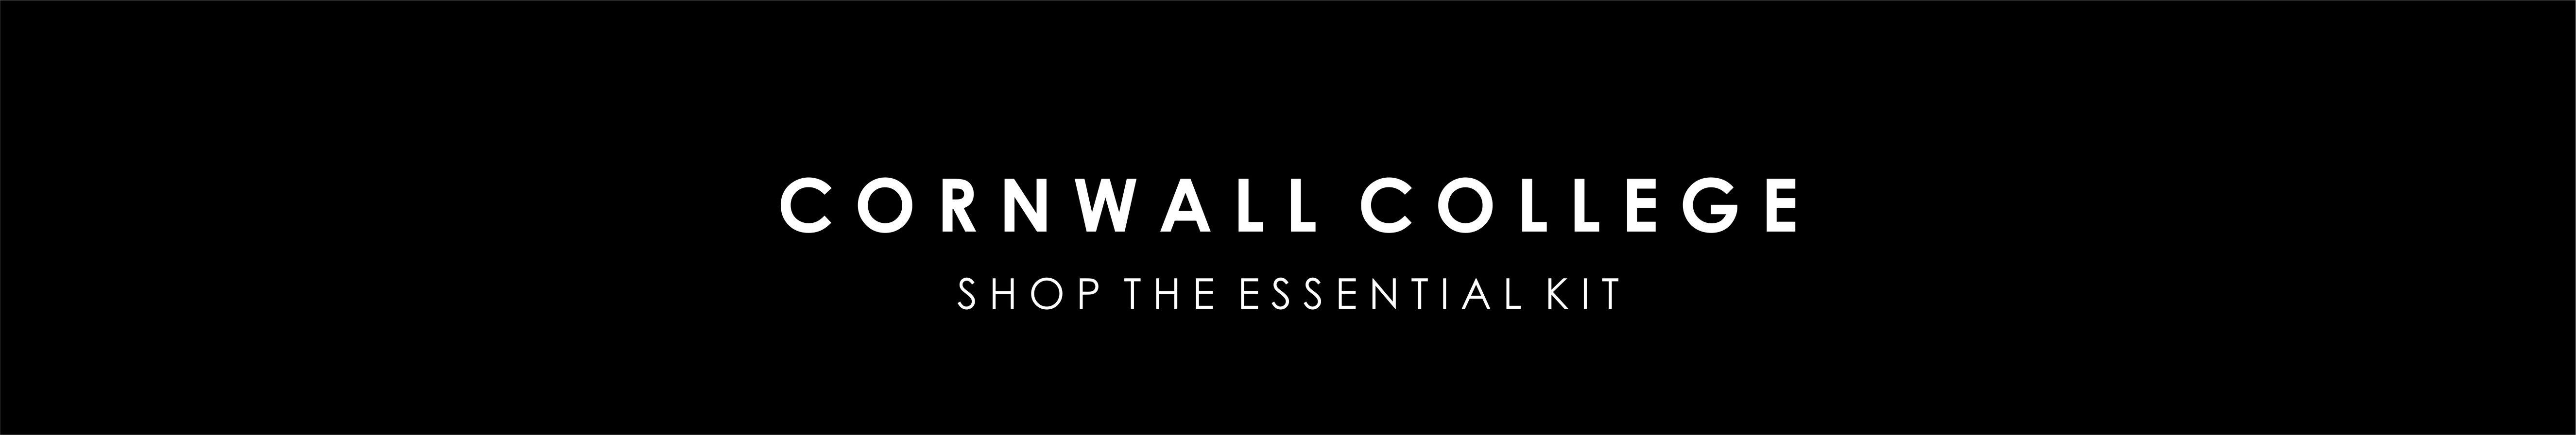 cornwall-college-banner-duchy-public-services.jpg